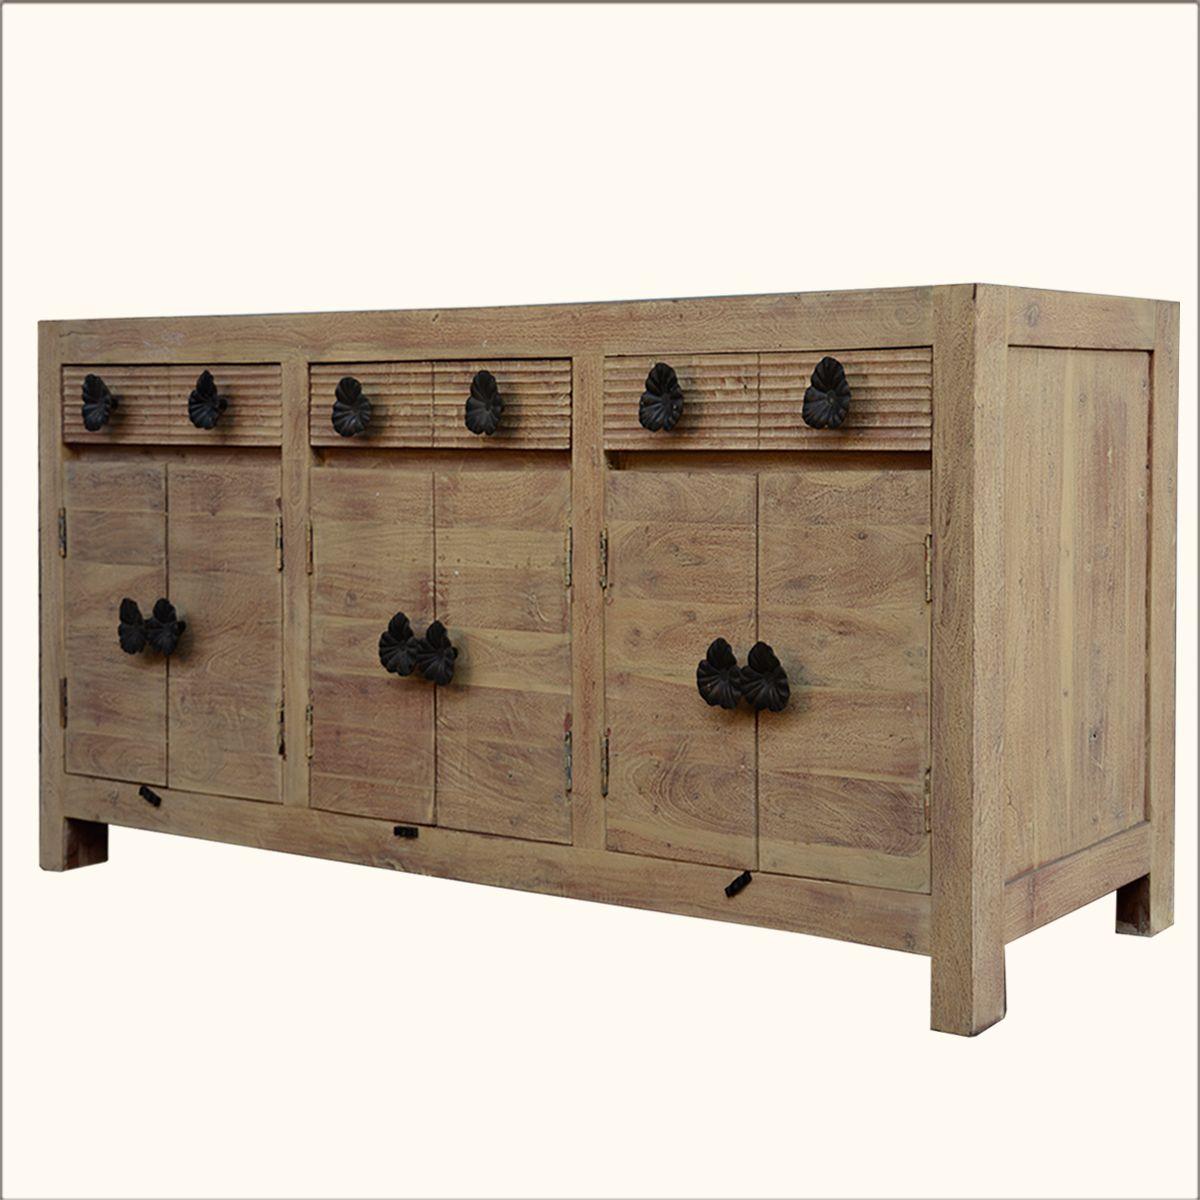 Santa Fe Black Orchid Reclaimed Wood 3 Cabinet Sideboard Buffet